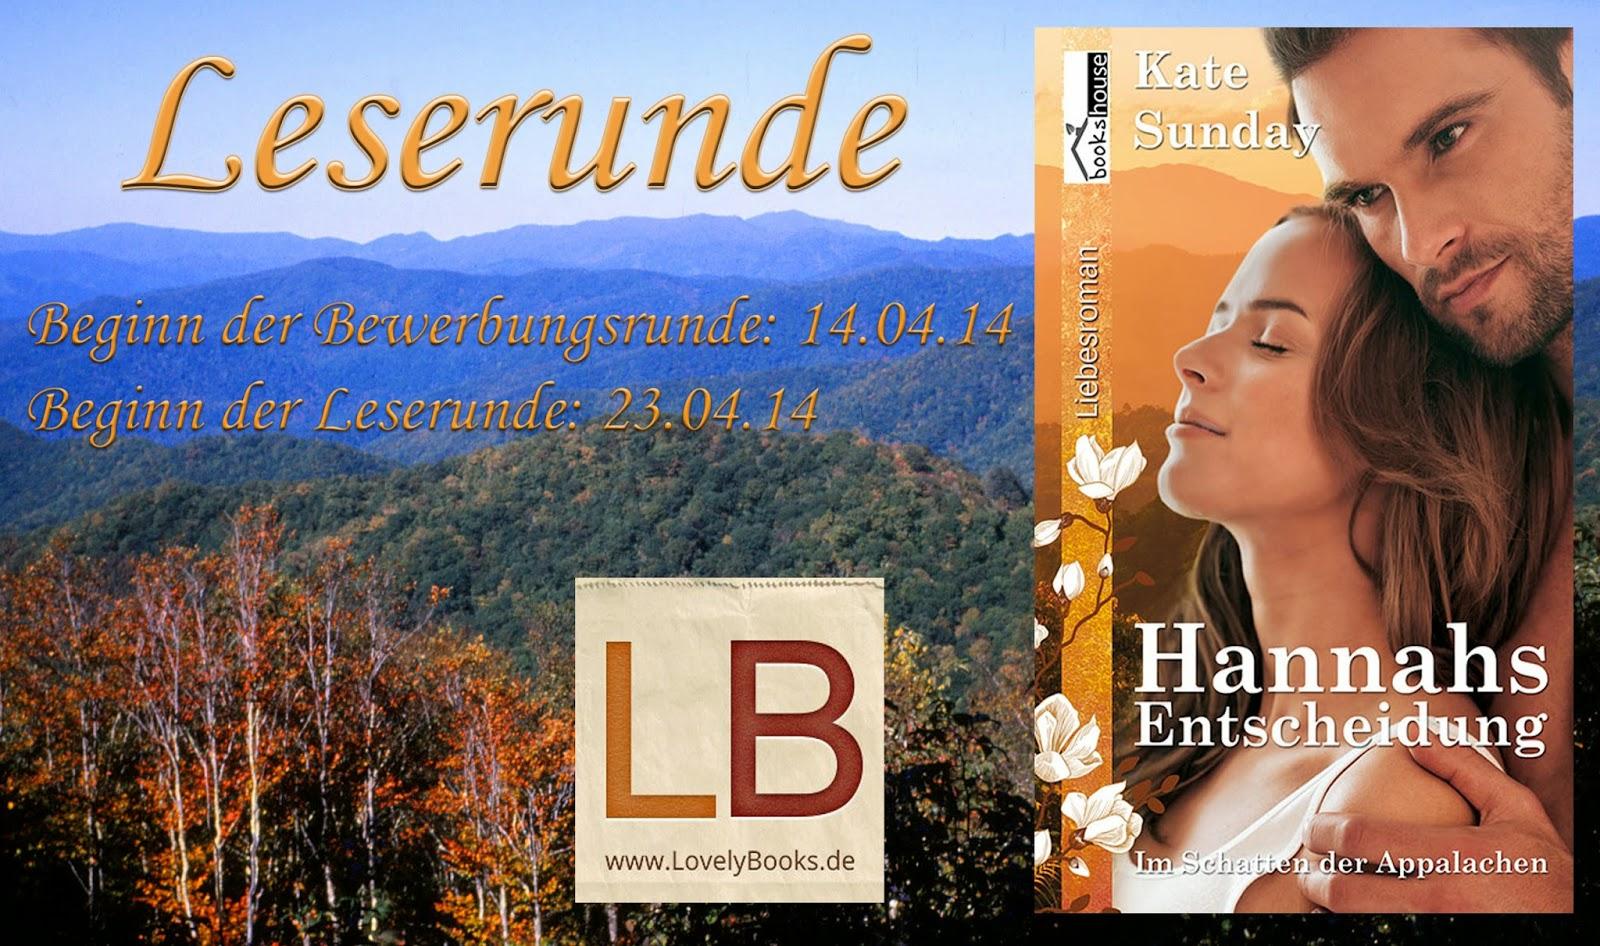 http://www.lovelybooks.de/autor/Kate-Sunday/Hannahs-Entscheidung-Im-Schatten-der-Appalachen-1-1078611424-w/leserunde/1087971690/1087971542/